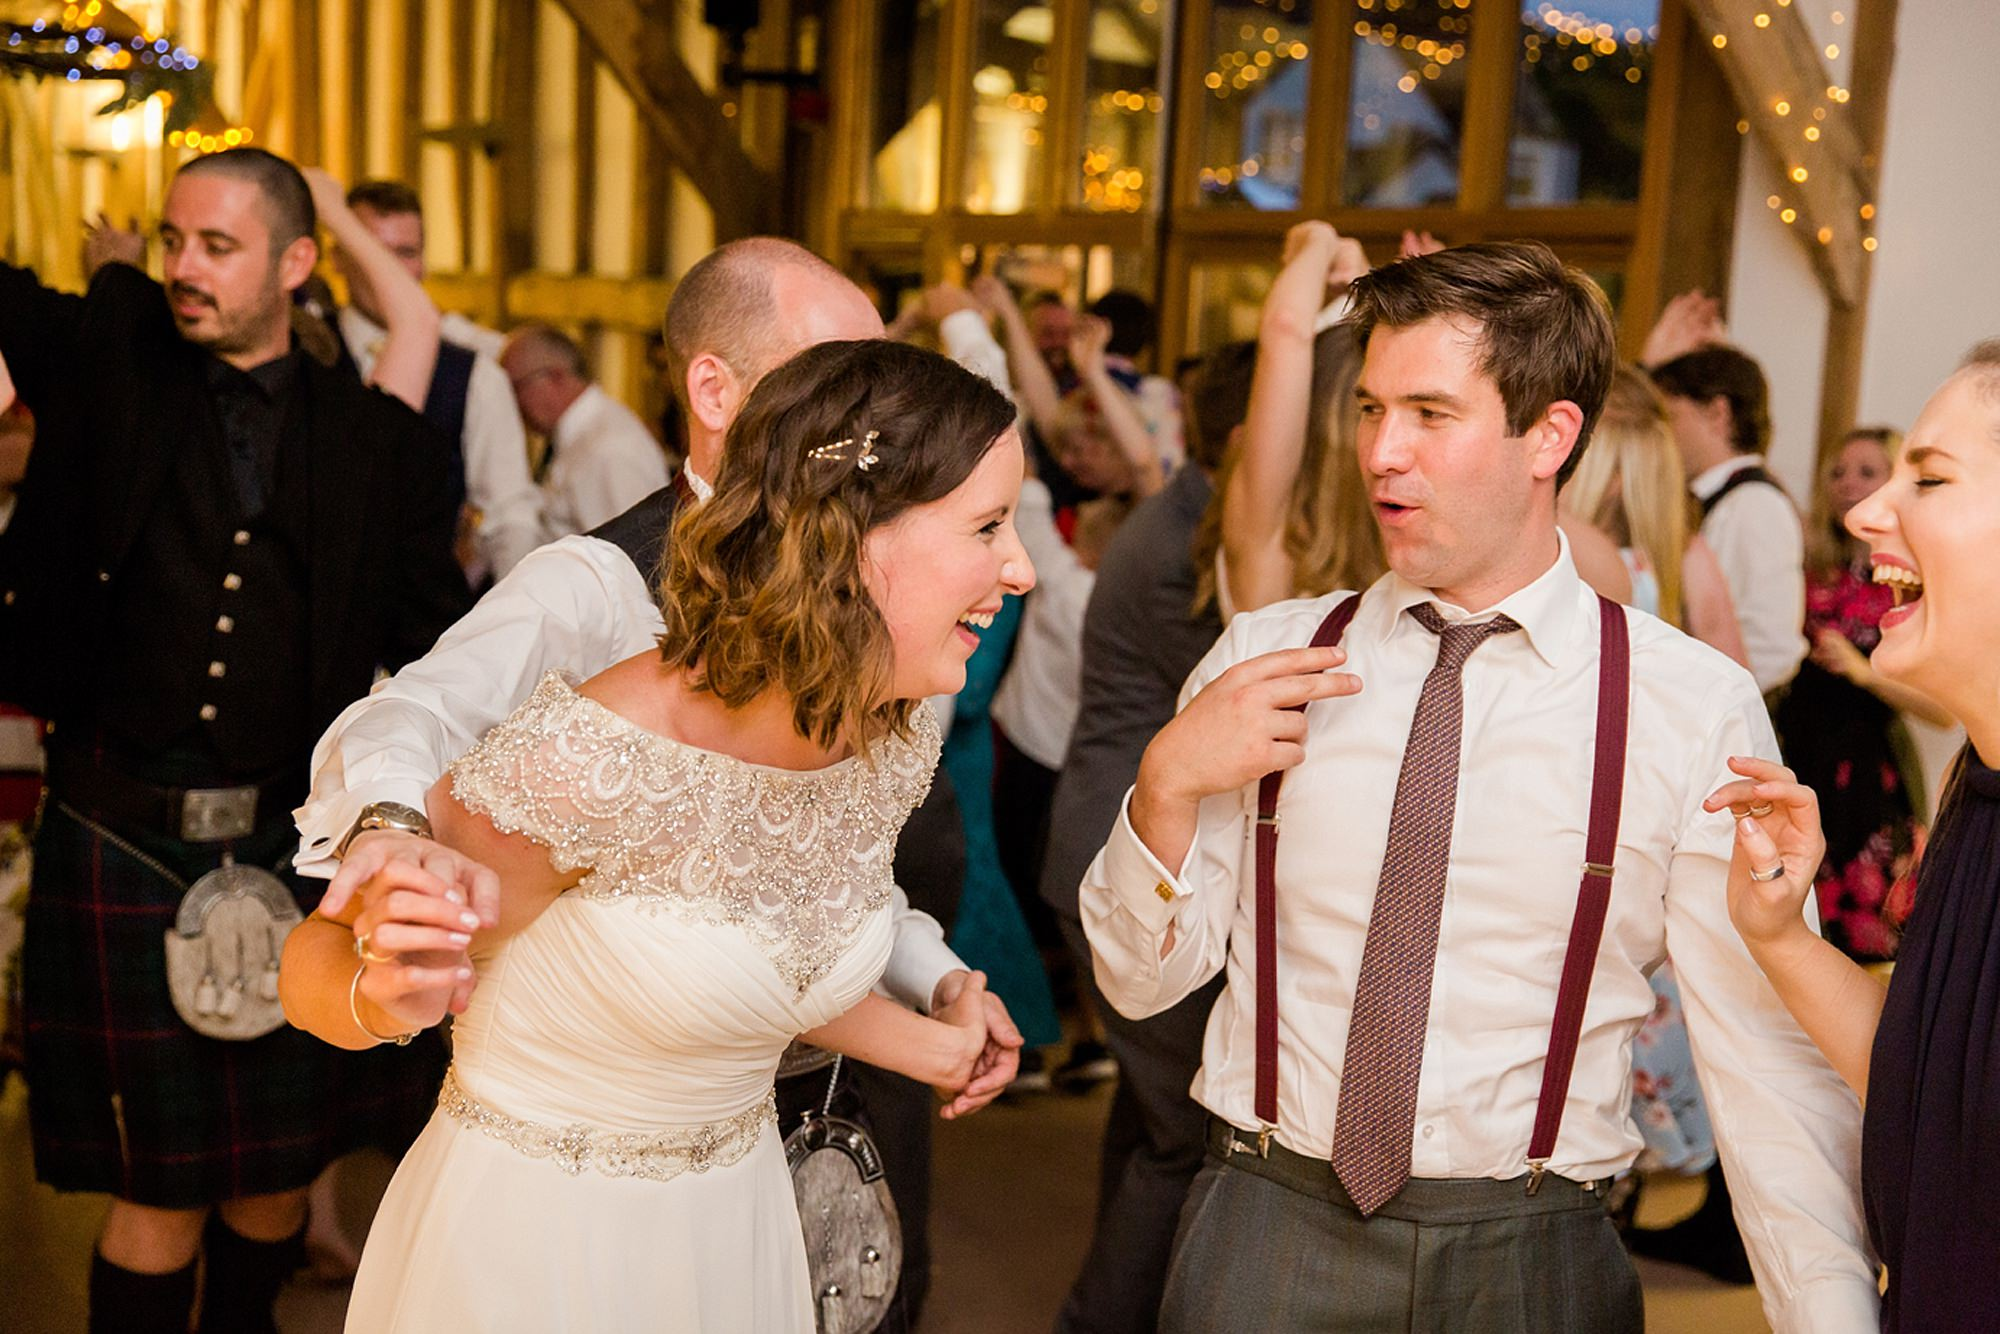 Outdoor humanist wedding photography ceilidh dance